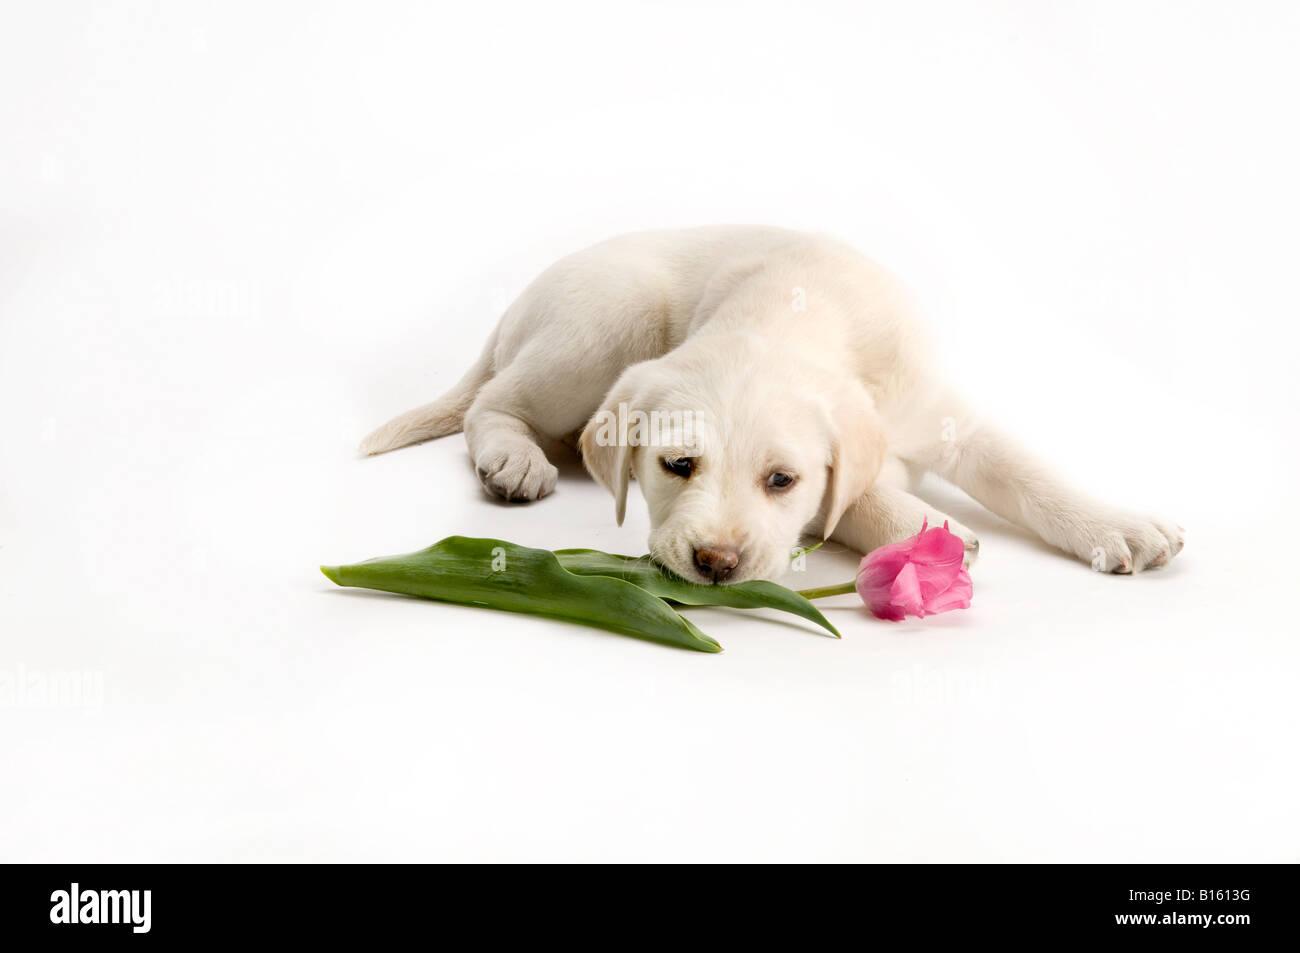 Labradorwelpe Kauen eine rosa Tulpe Blume Stockbild